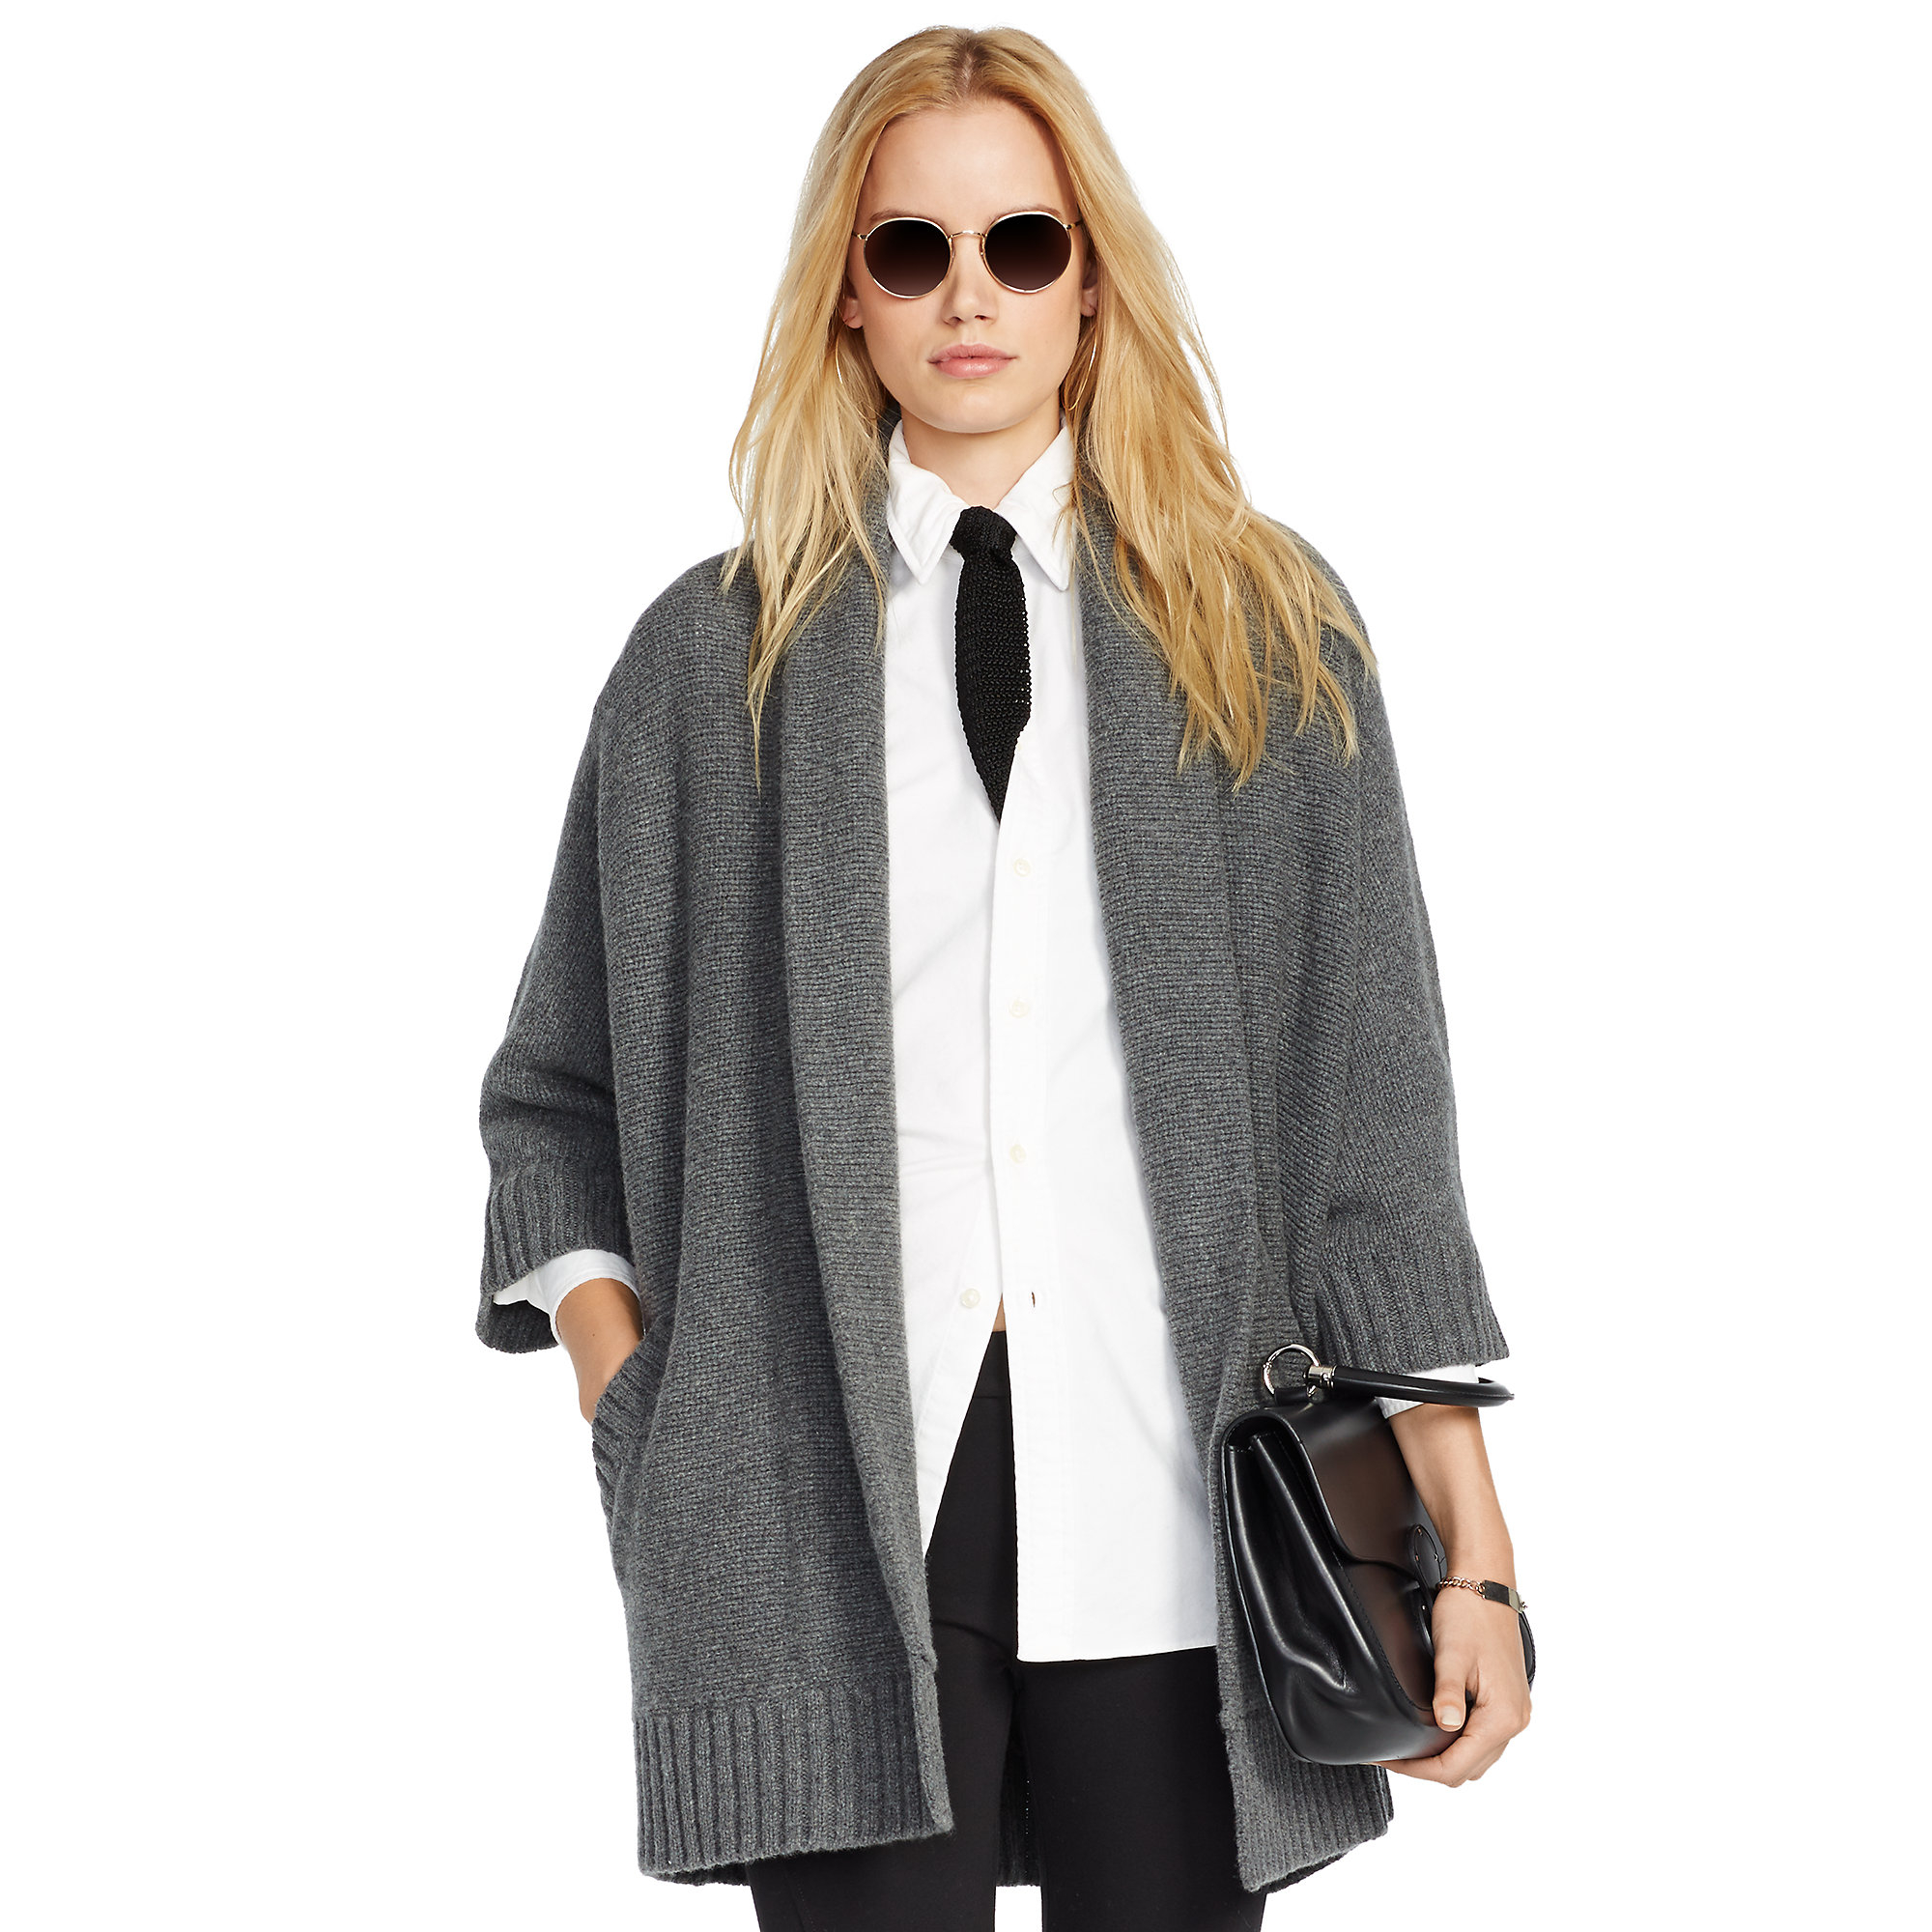 aca6825293d43 Lyst - Polo Ralph Lauren Merino Wool Cashmere Cardigan in Gray